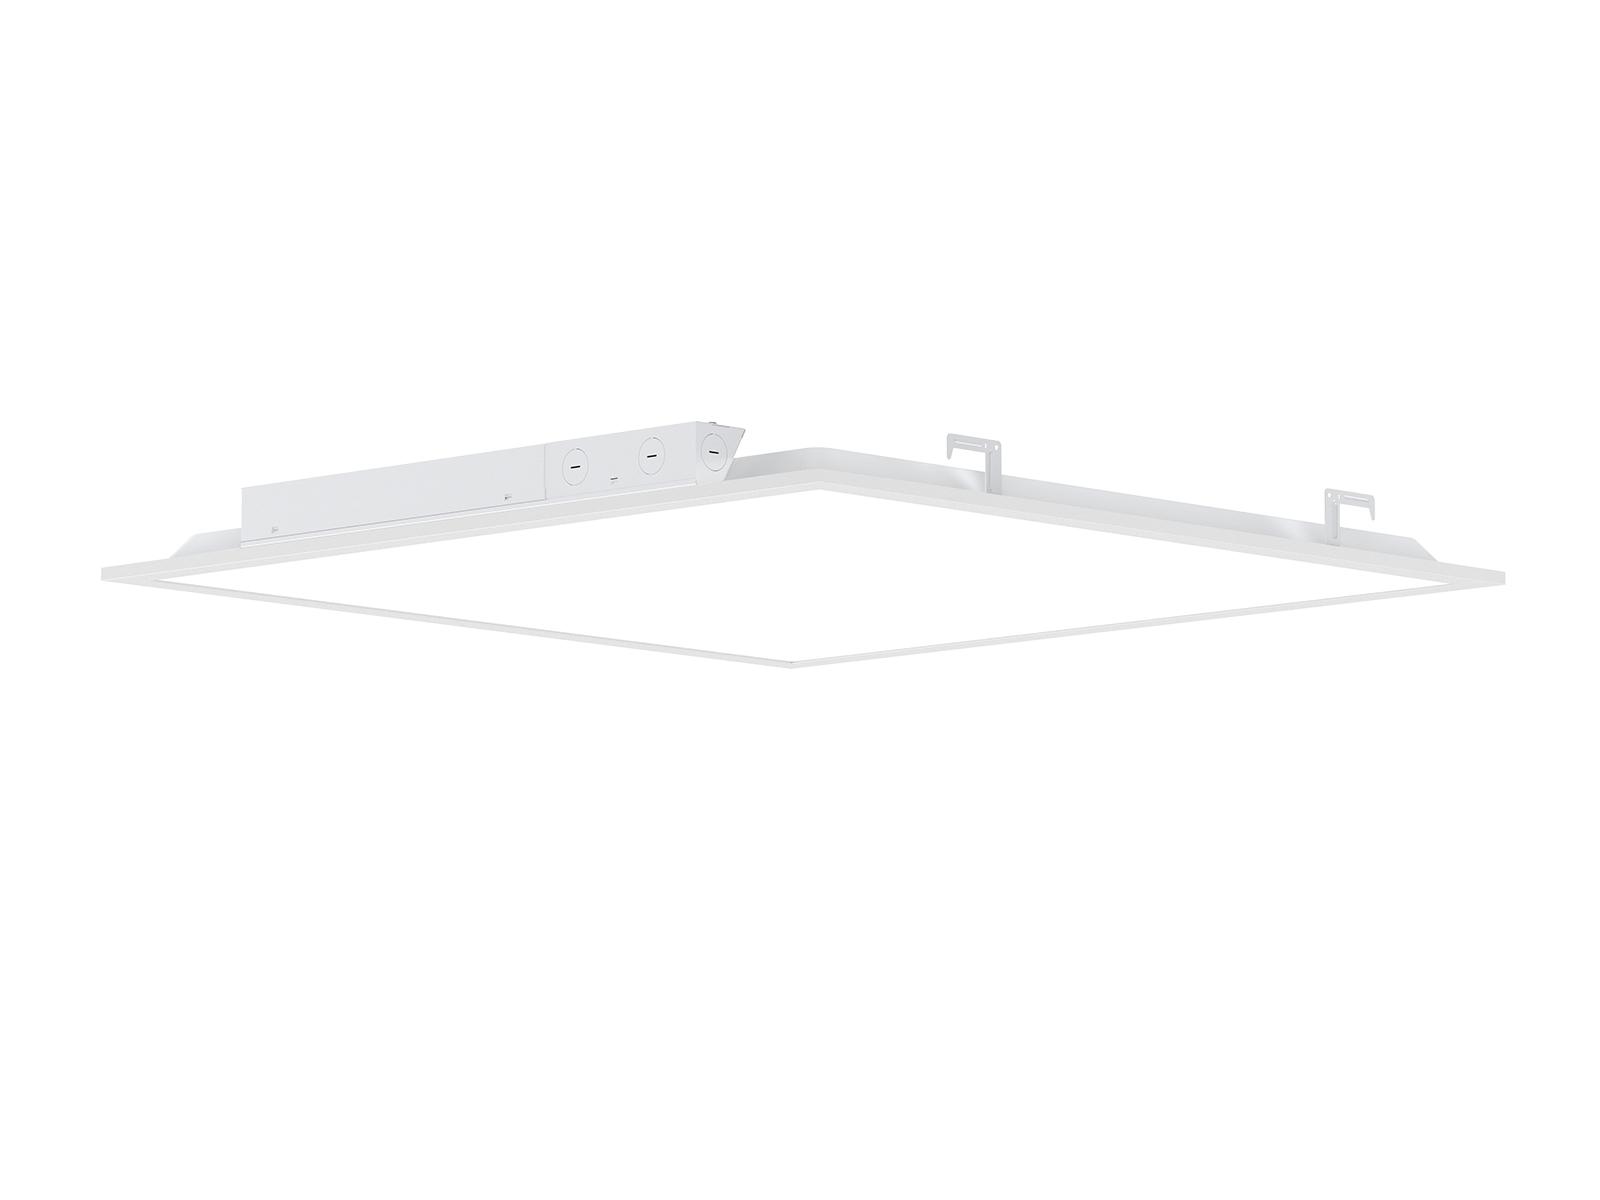 Pl Ck Led 60x60 Office Ceiling Flat Panel Light Upshine Lighting